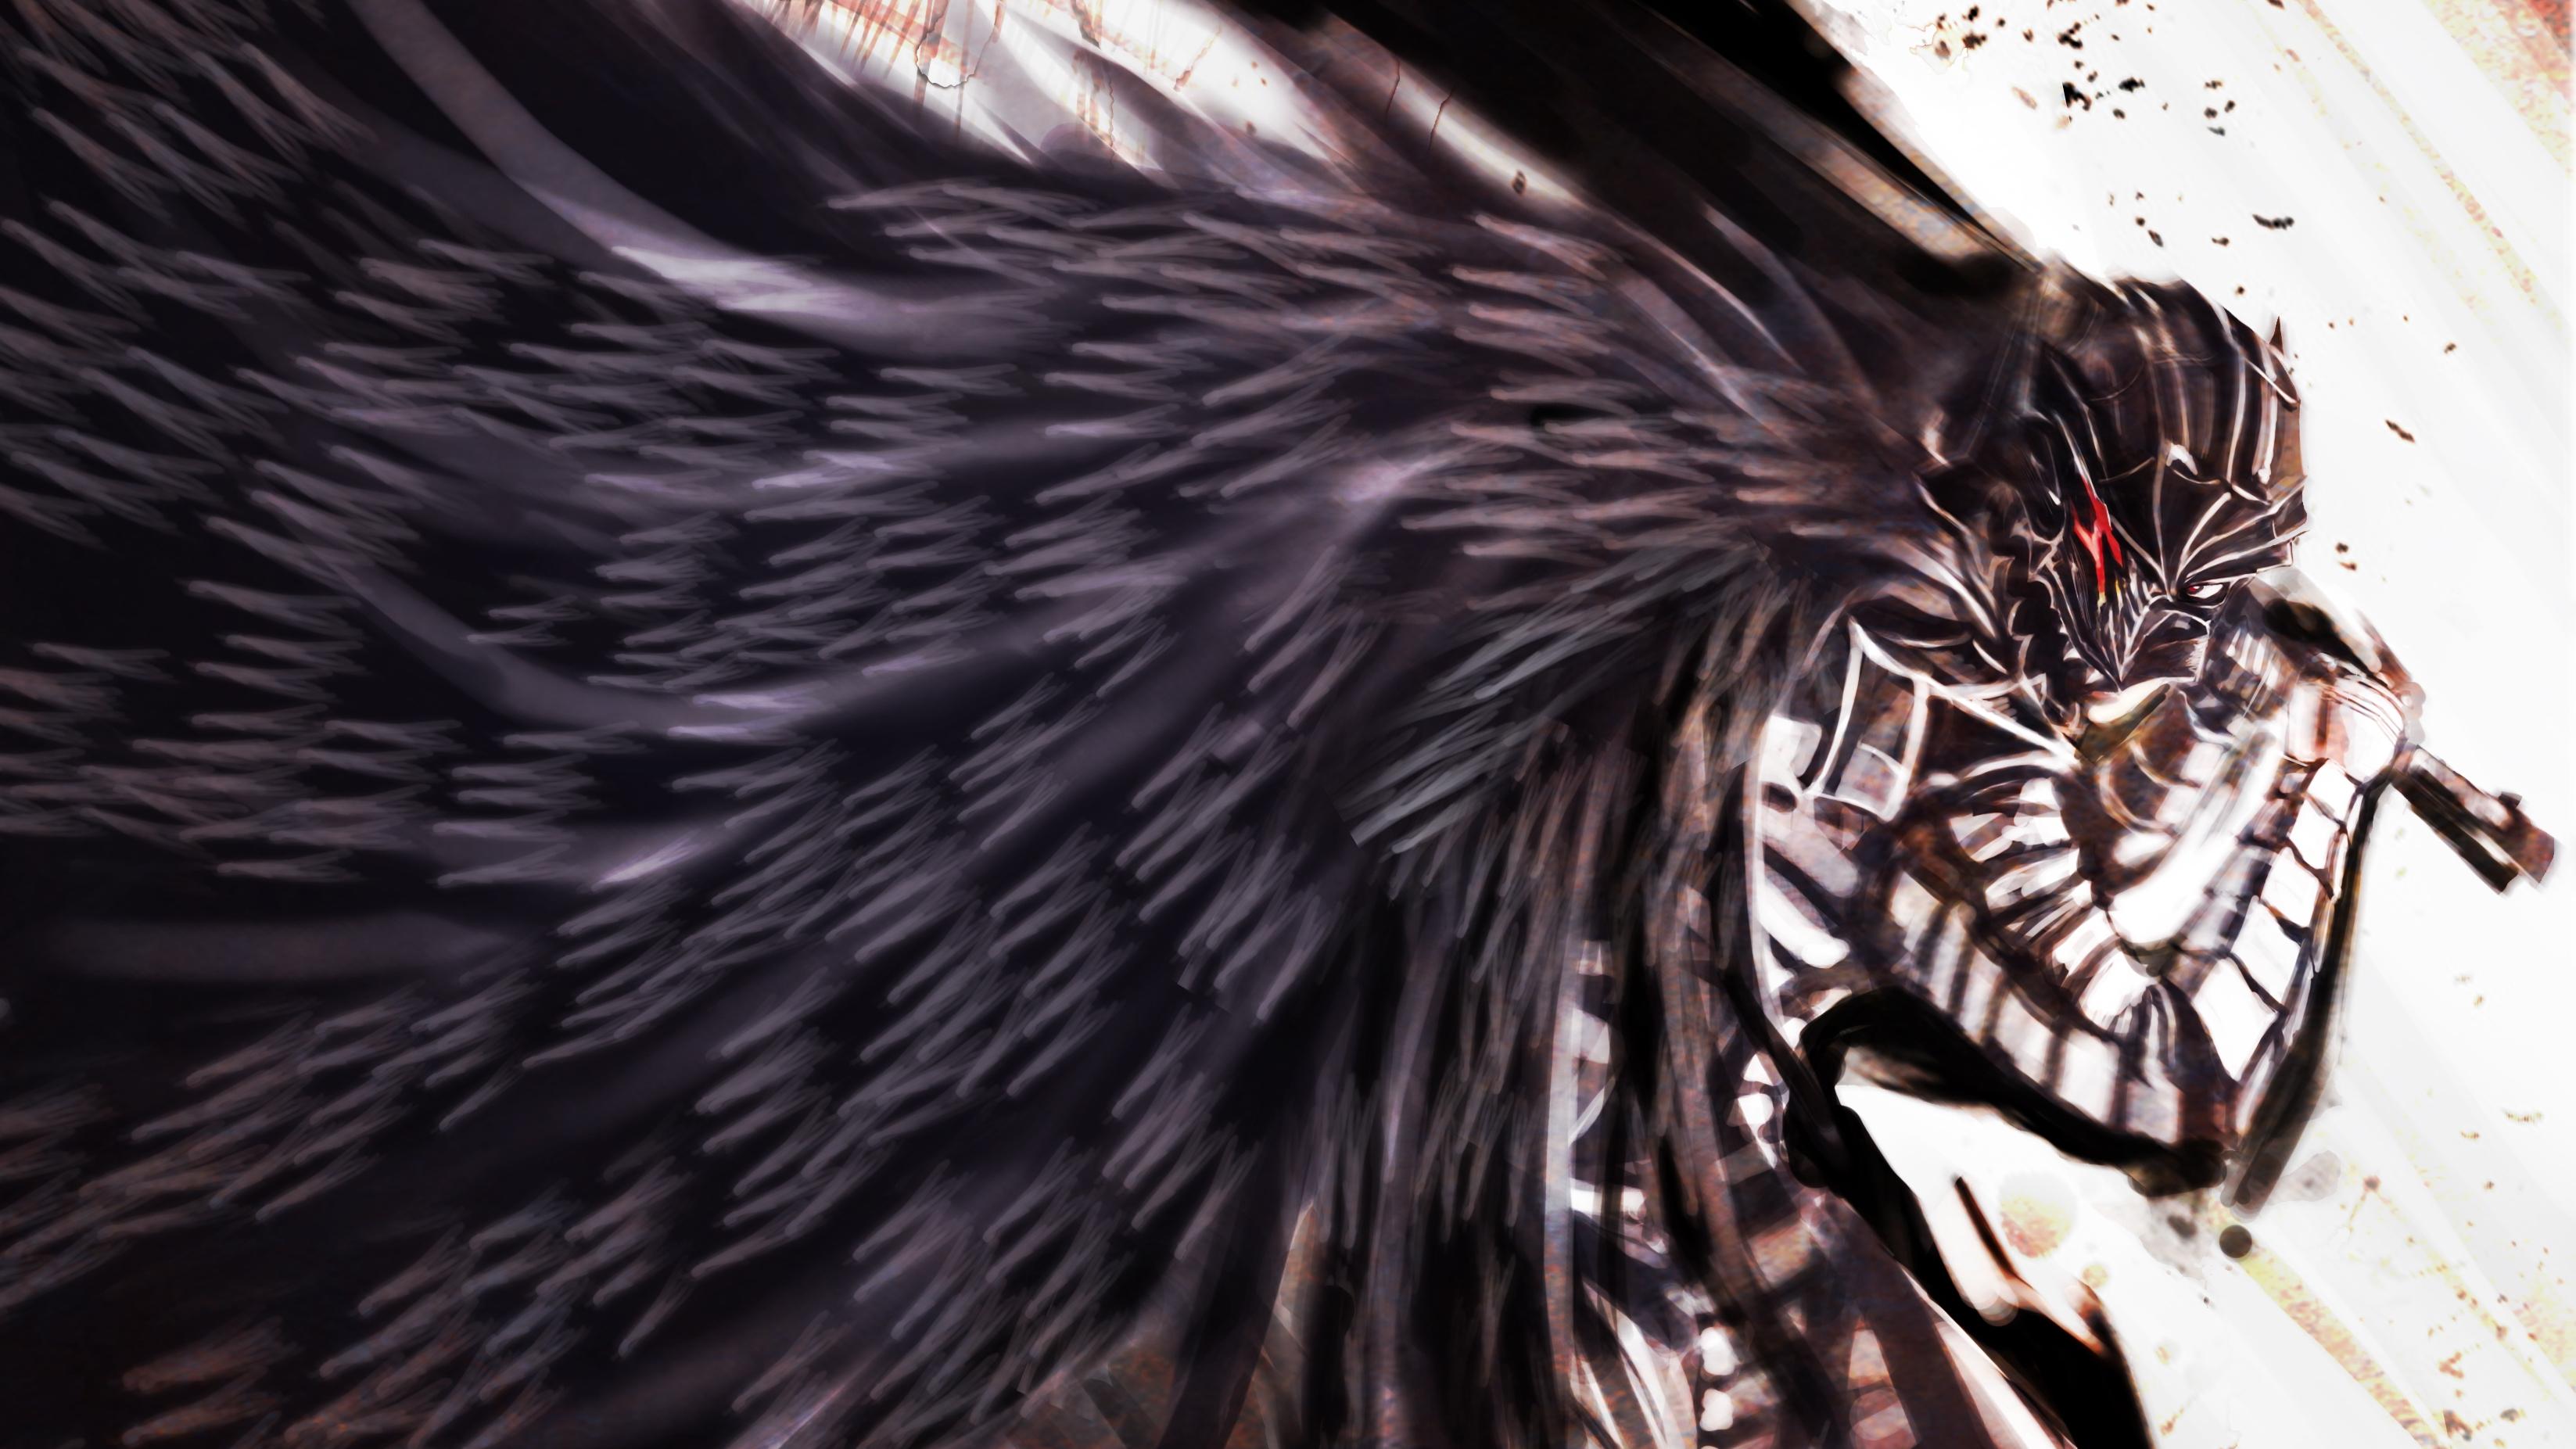 Berserk Full HD Wallpaper And Background Image